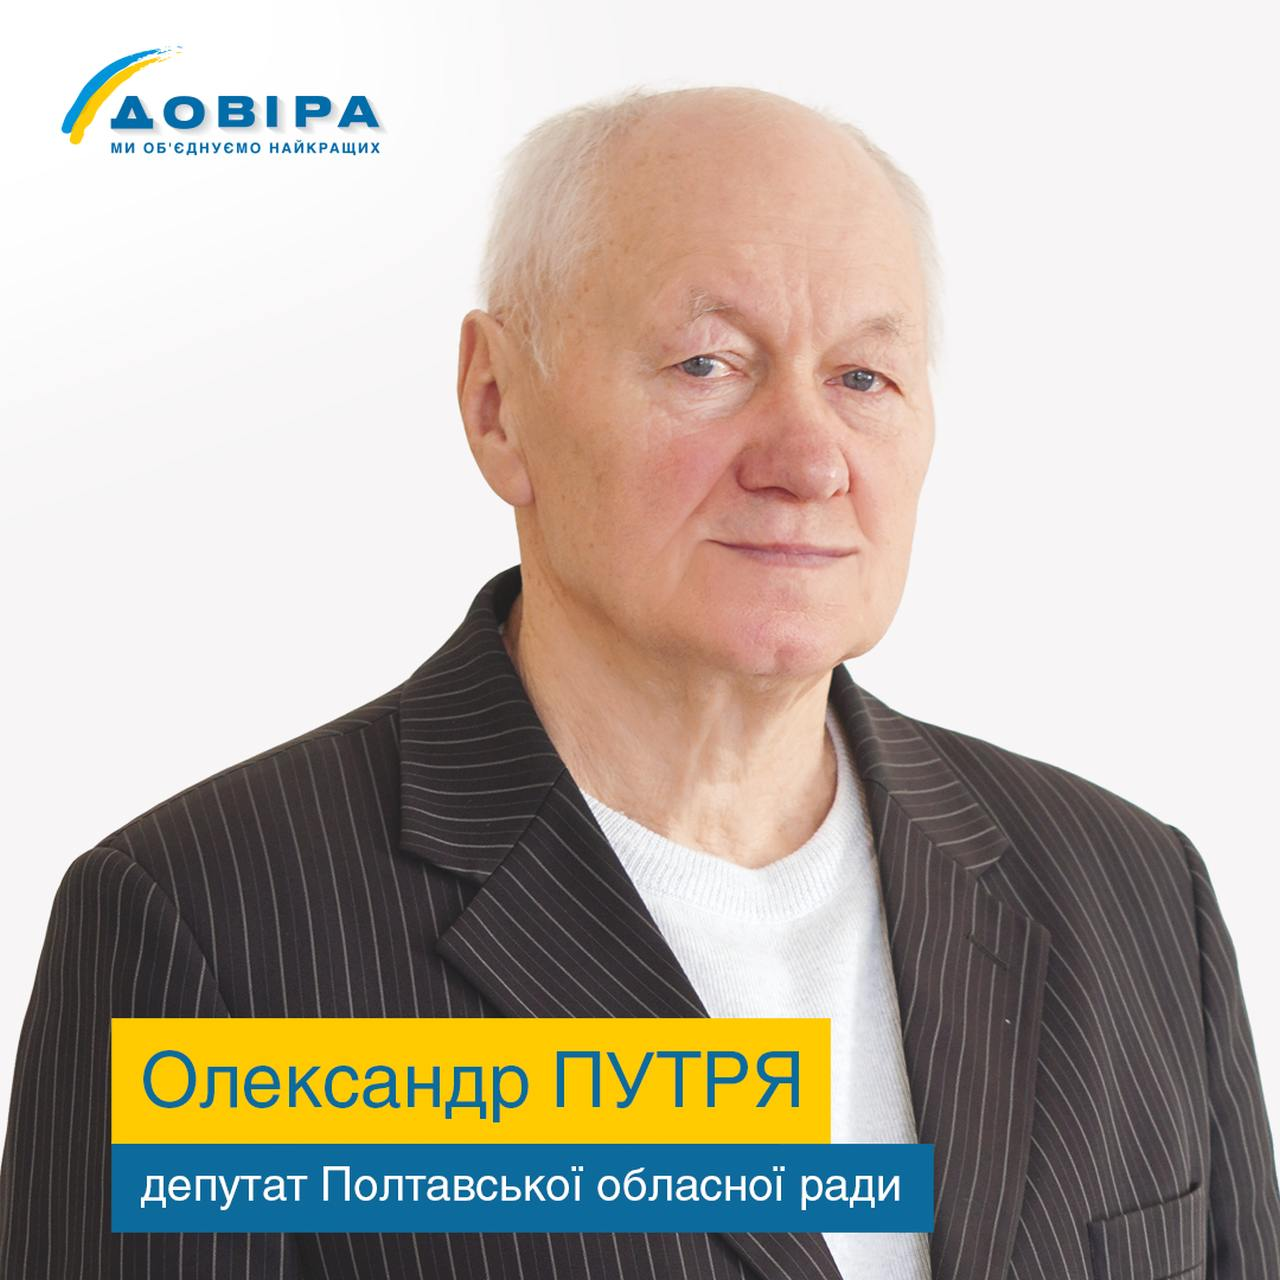 Олександр Путря